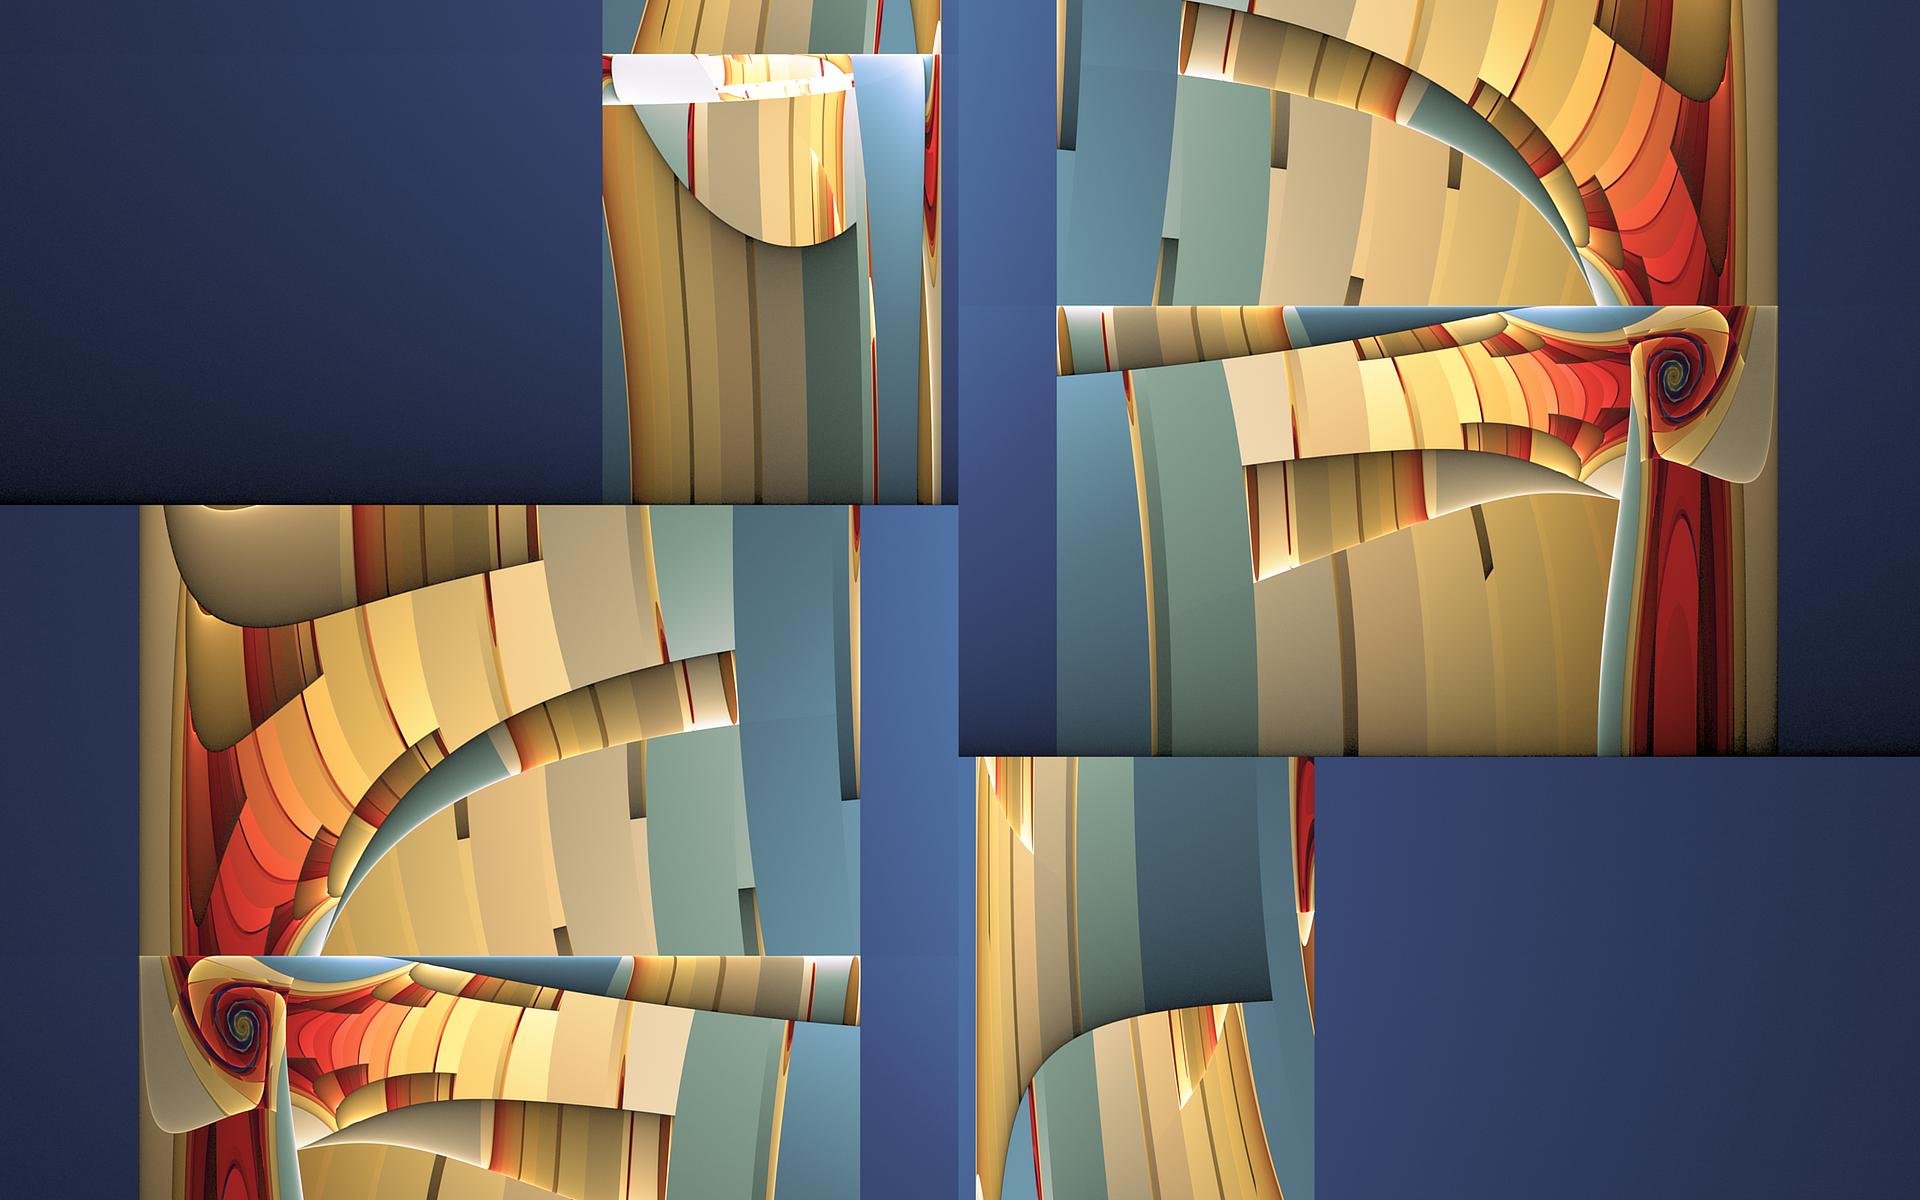 Papercraft by tatasz